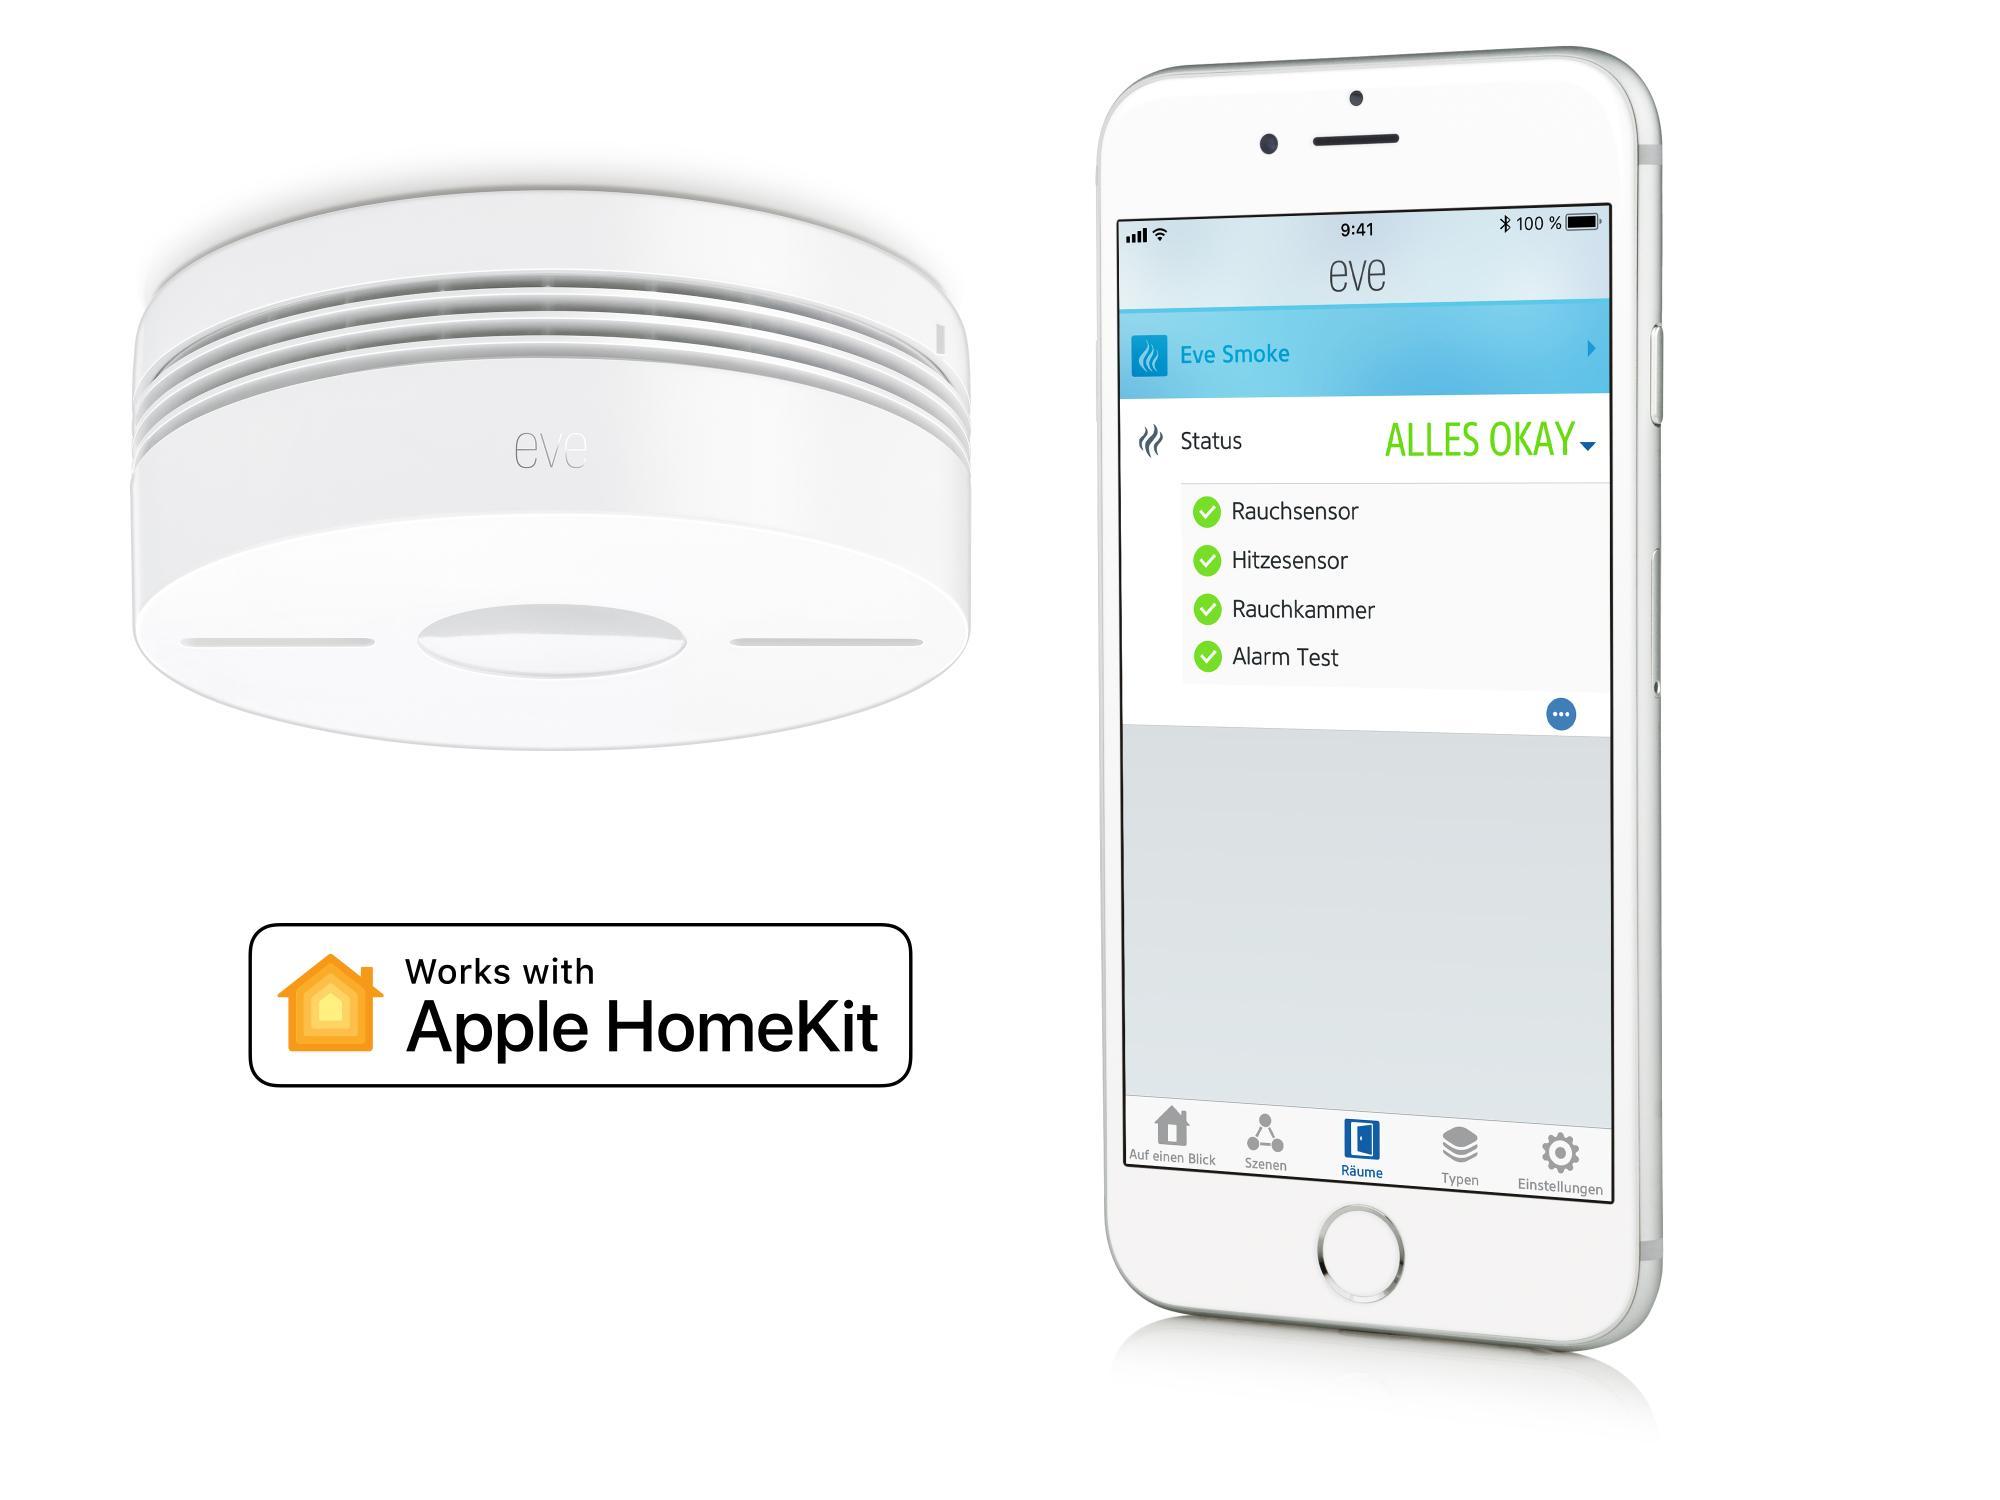 eve smoke rauchmelder mit homekit anbindung kommt in den handel mac i. Black Bedroom Furniture Sets. Home Design Ideas